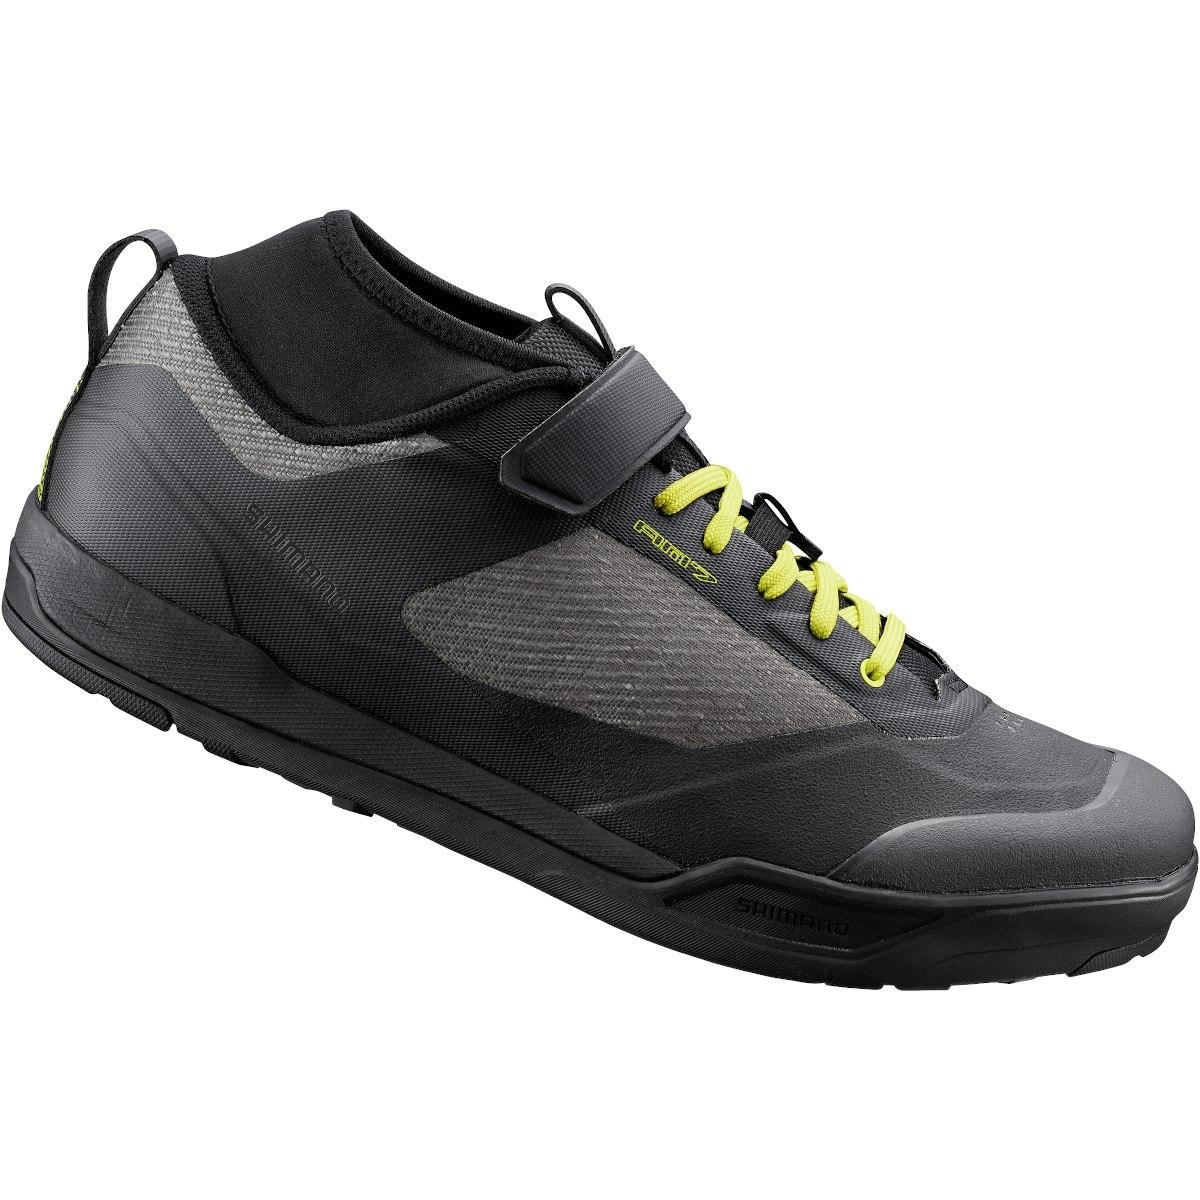 Shimano SH-AM702 Gravity SPD Shoe - black